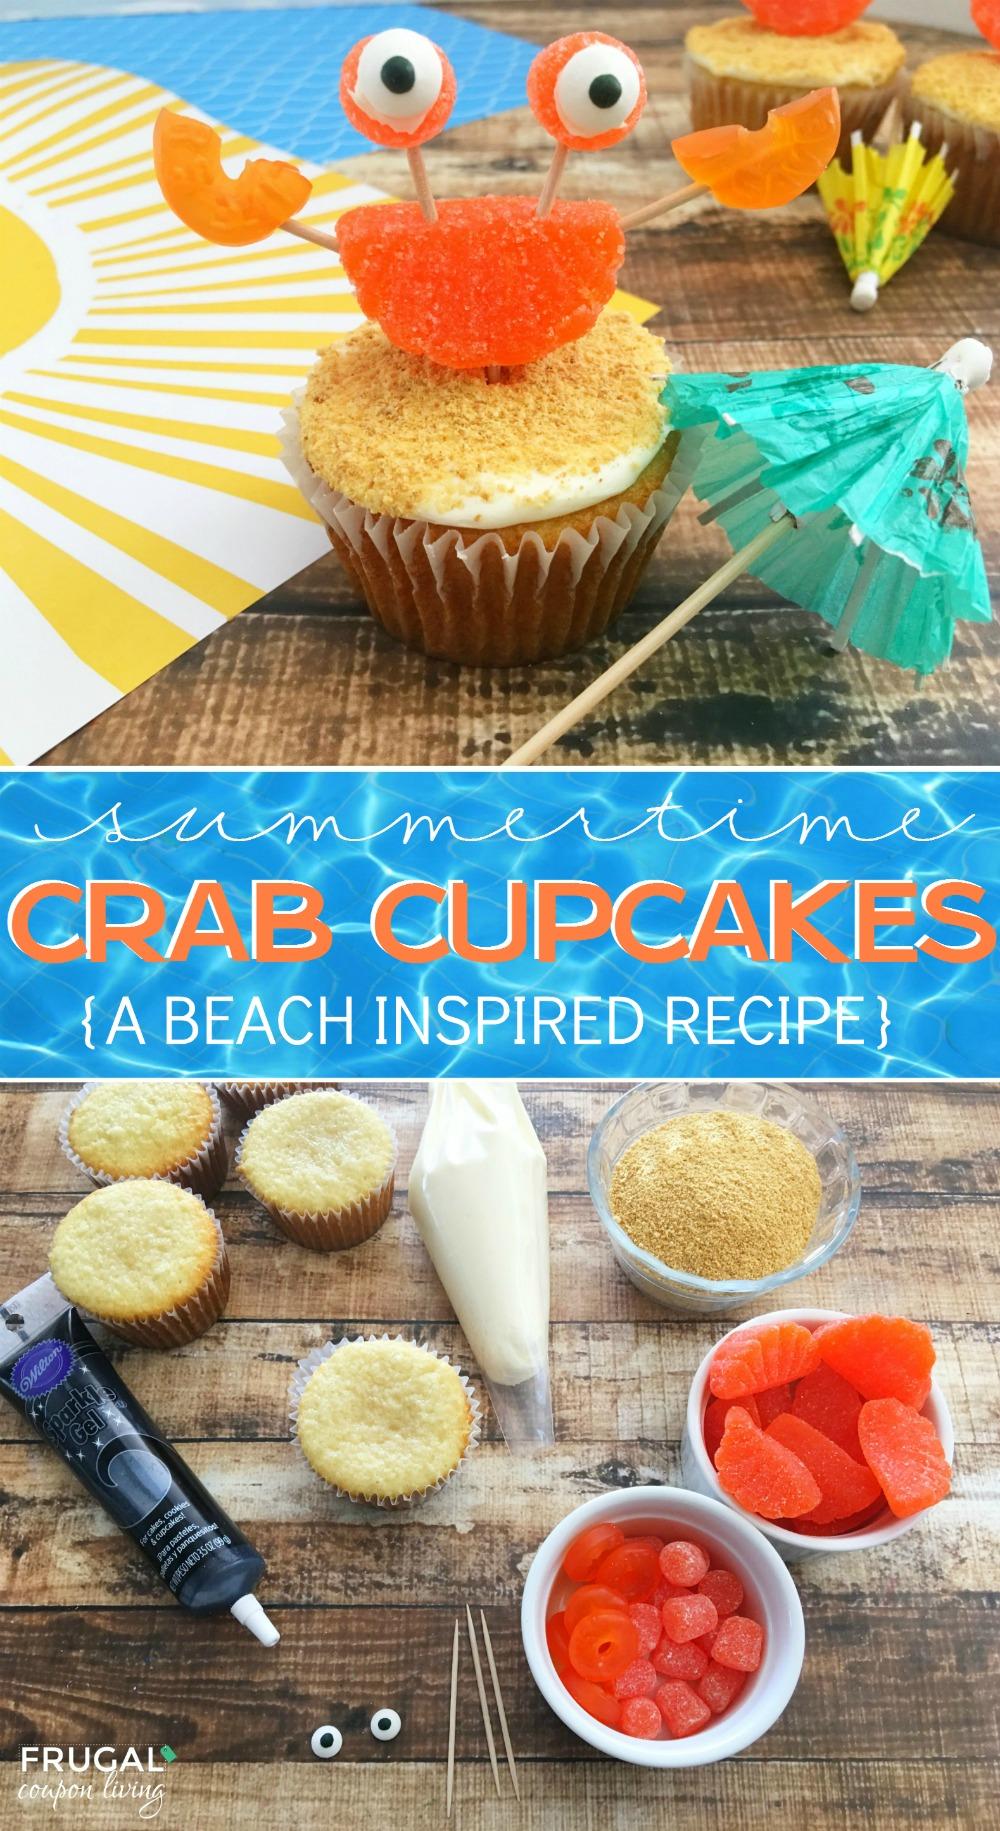 Crab-beach-cupcake-short-collage-frugal-coupon-living